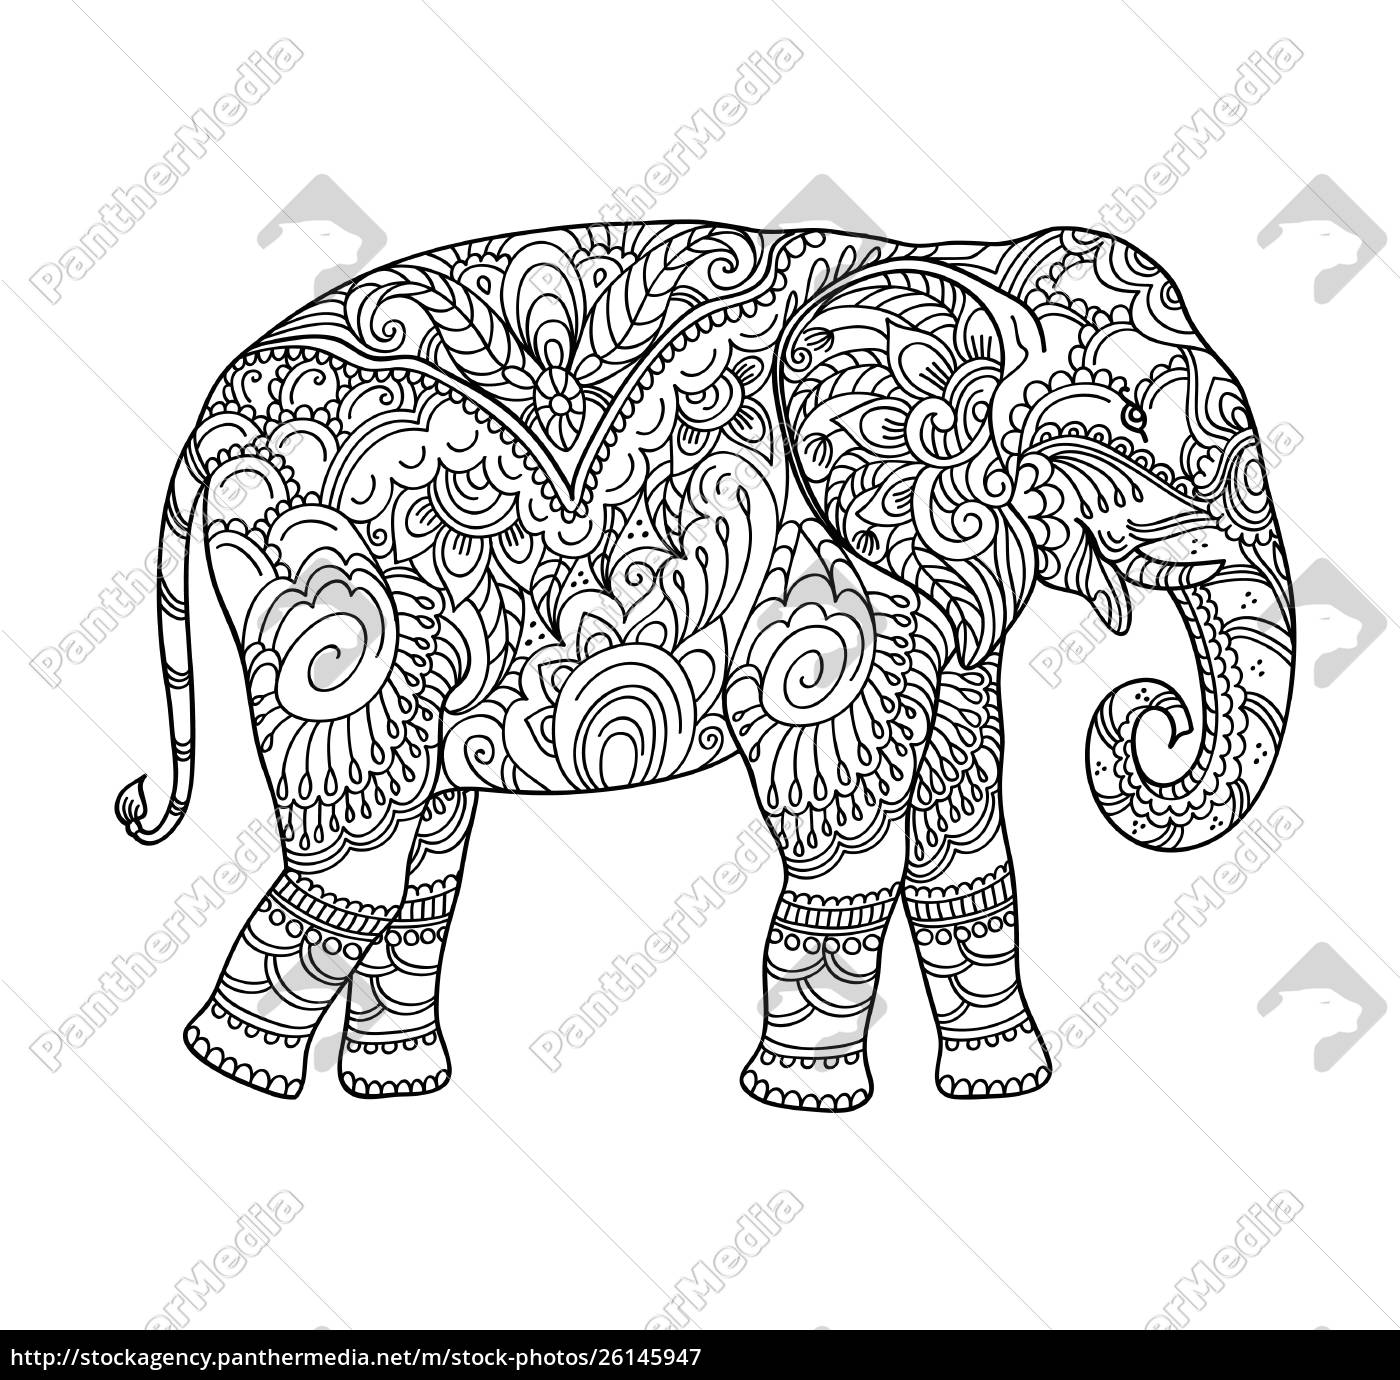 dibujo, zentangle, elefante, para, colorear, libro, para - 26145947